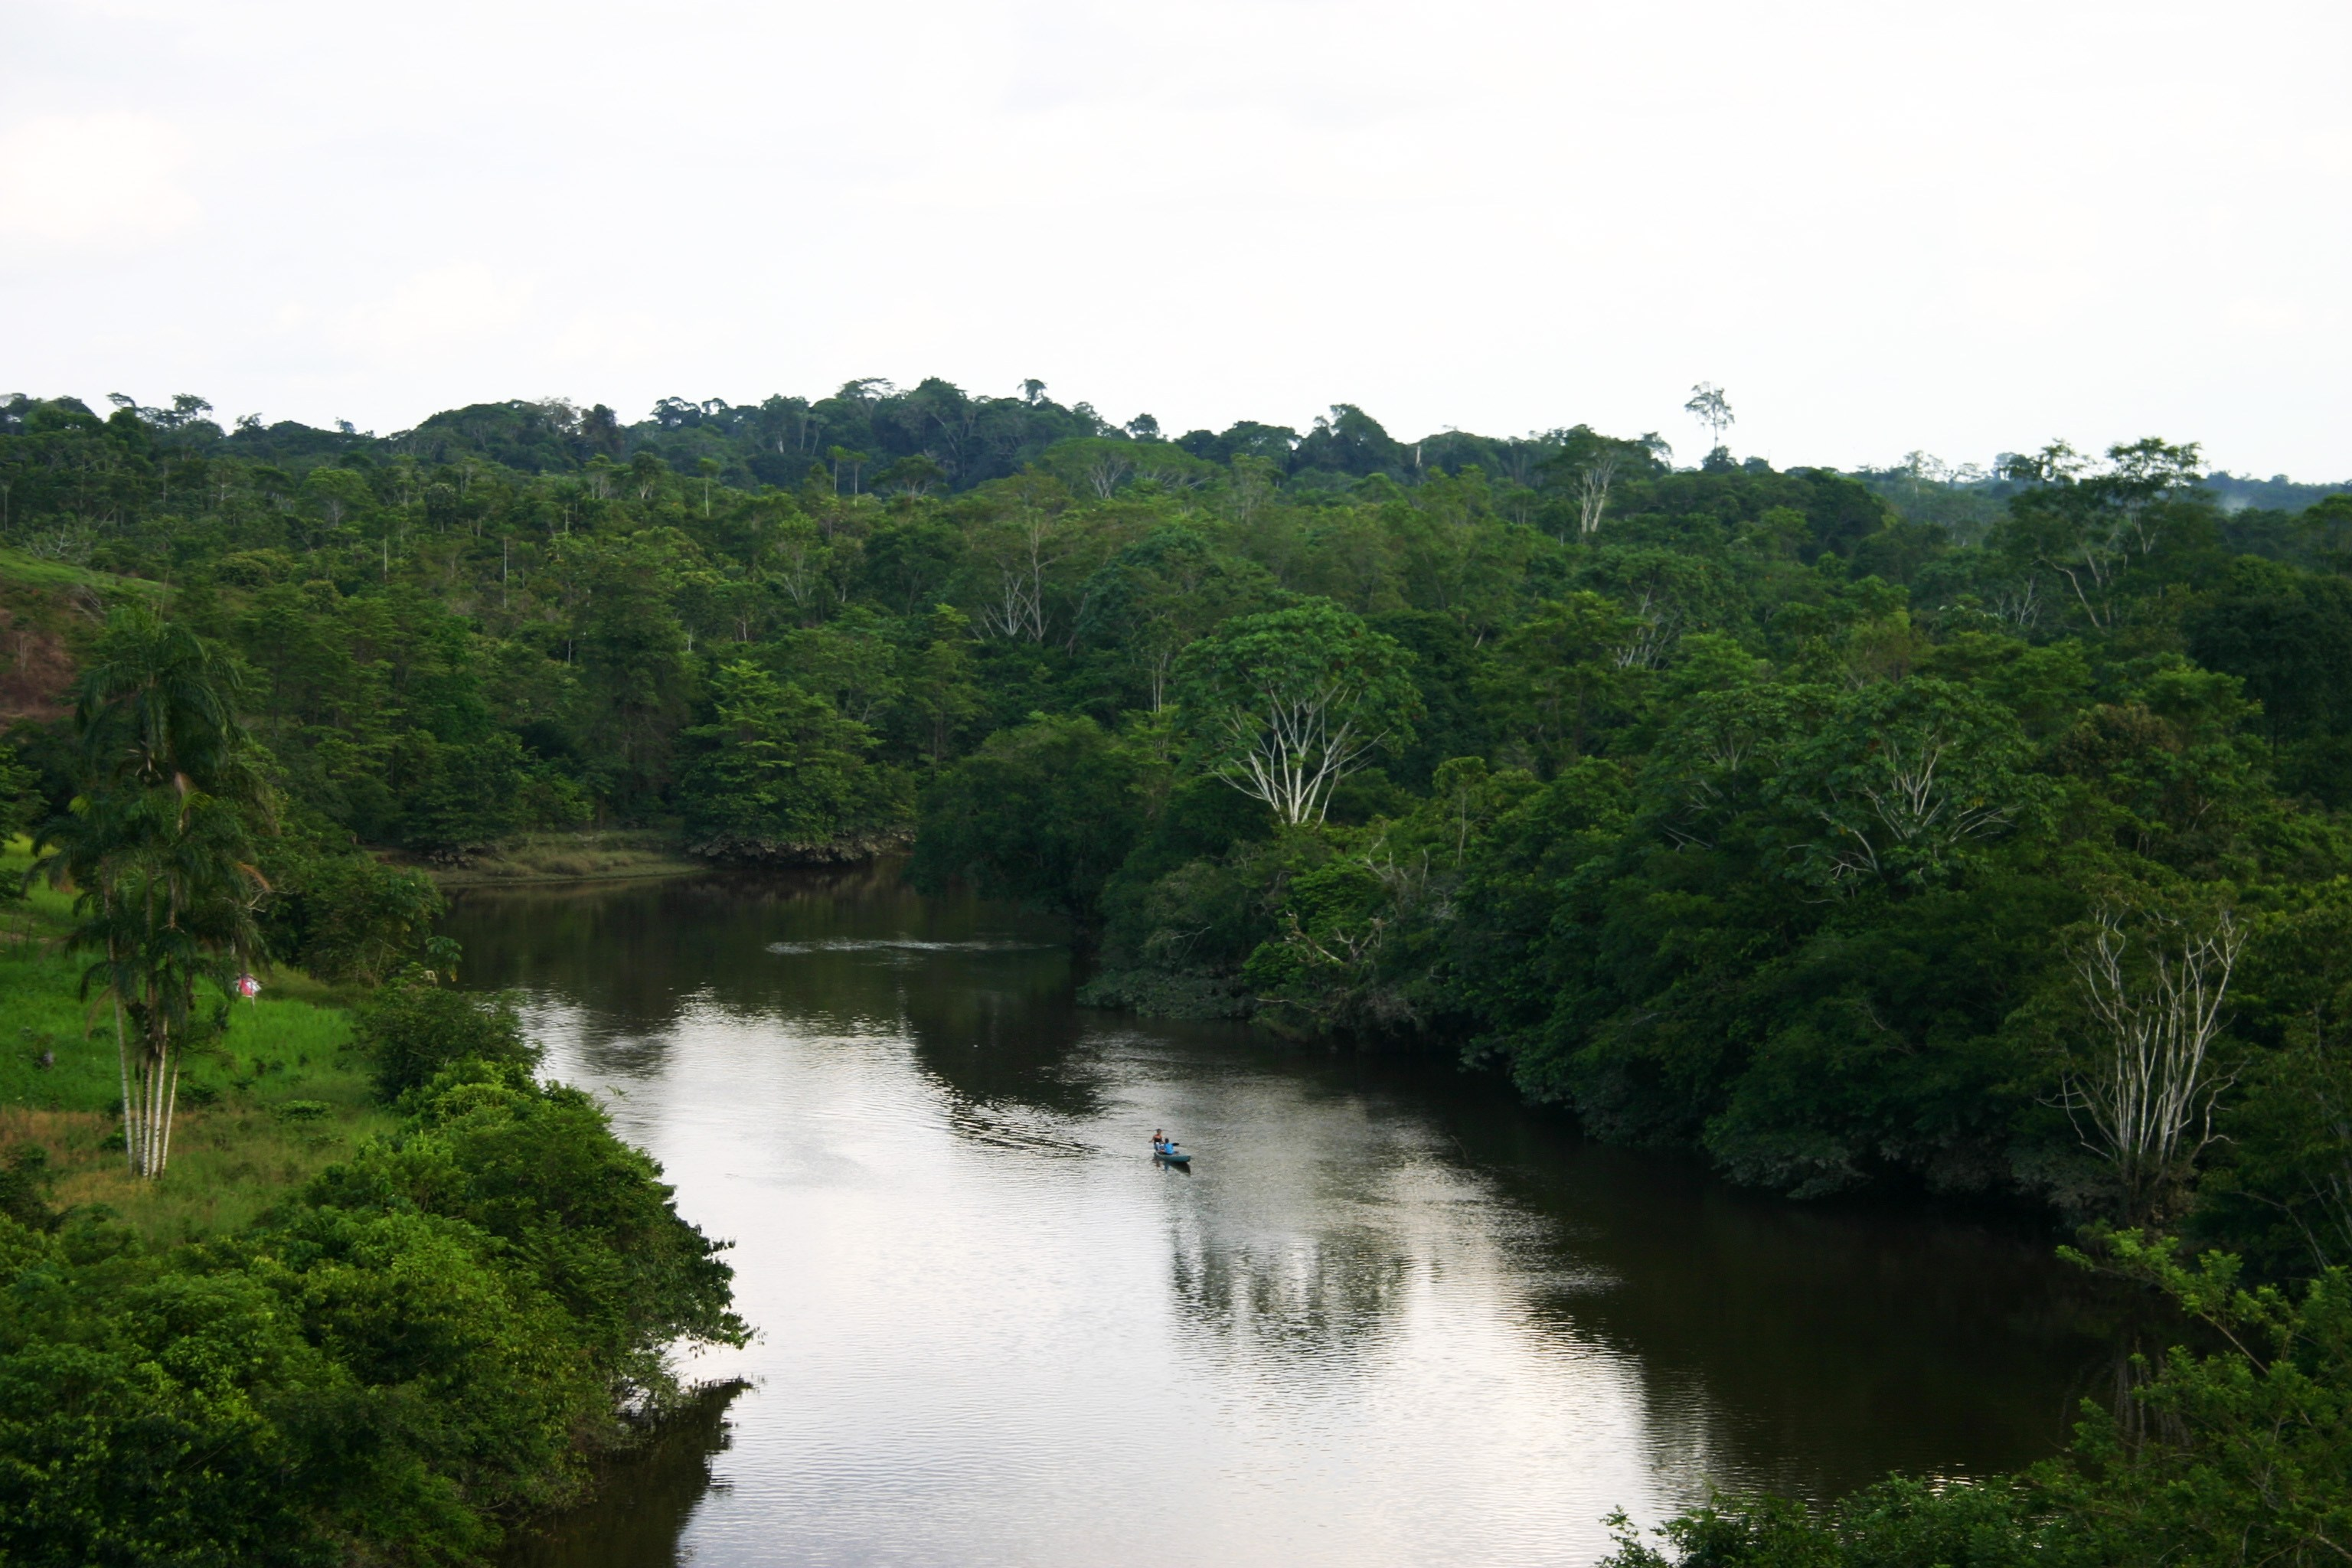 Zona de Reserva Campesina Perla Amazónica (ZRCPA)